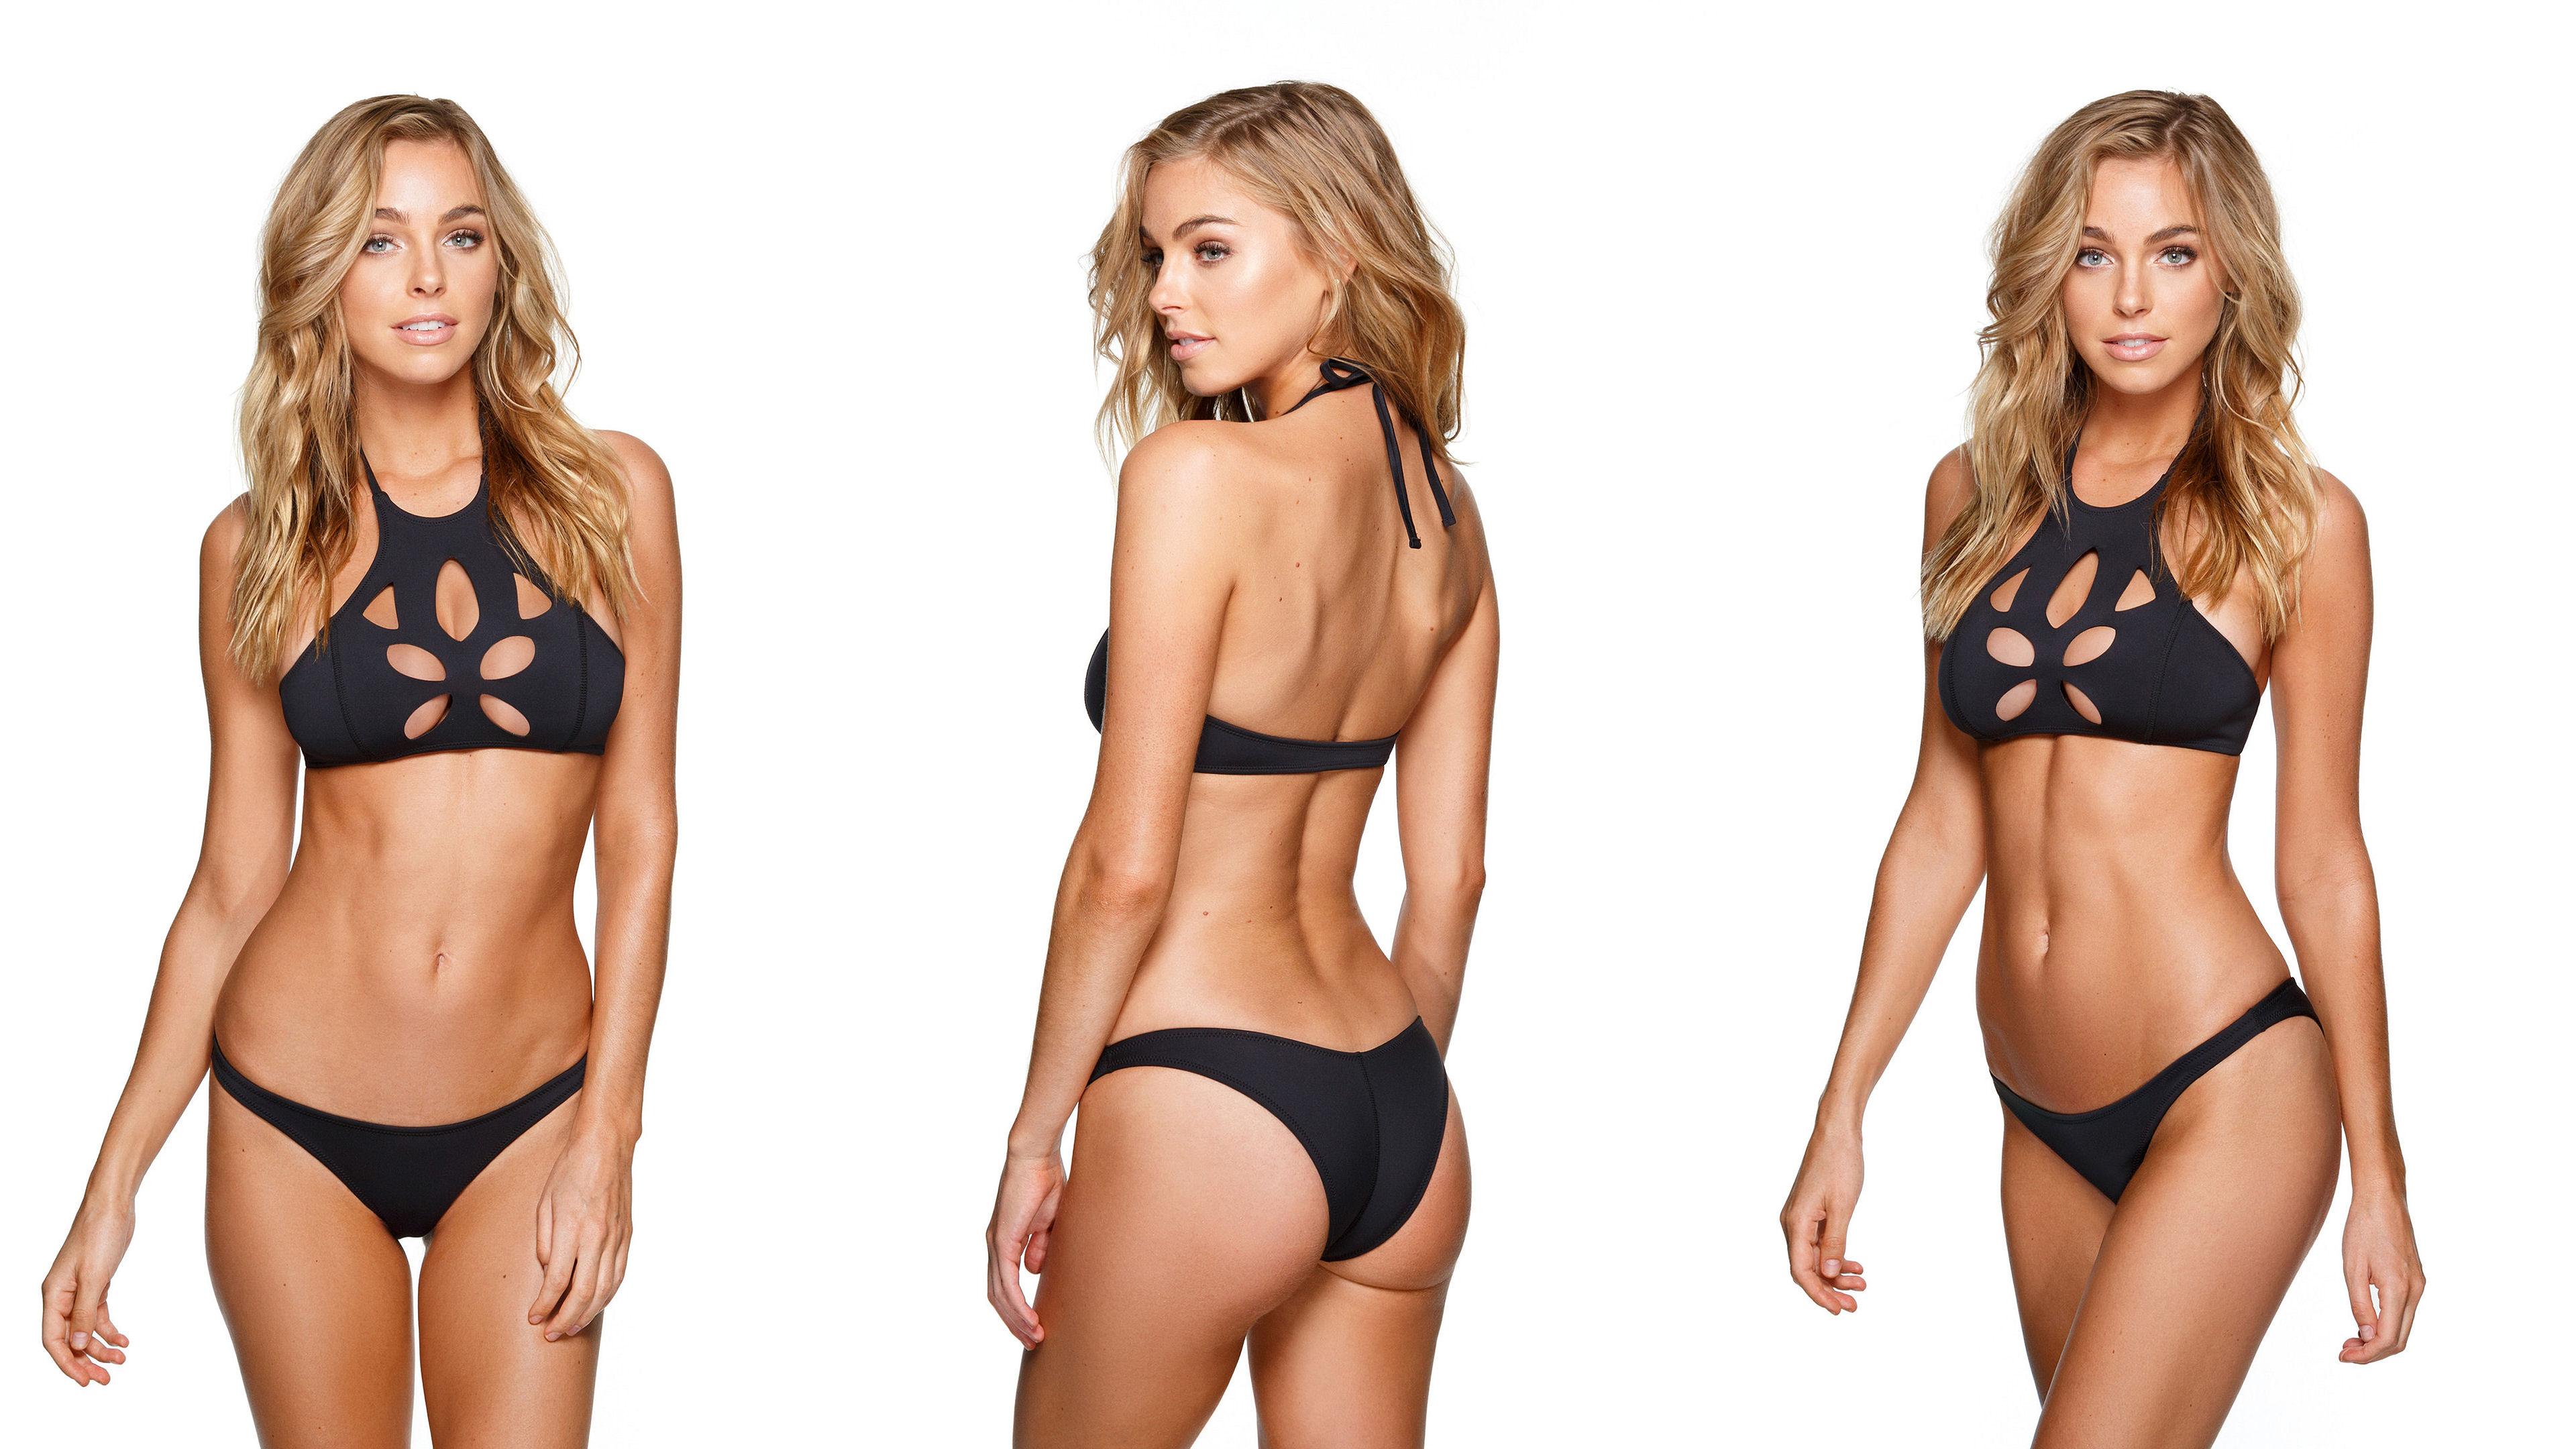 wallpaper : elizabeth turner, black bikini, blonde, panties